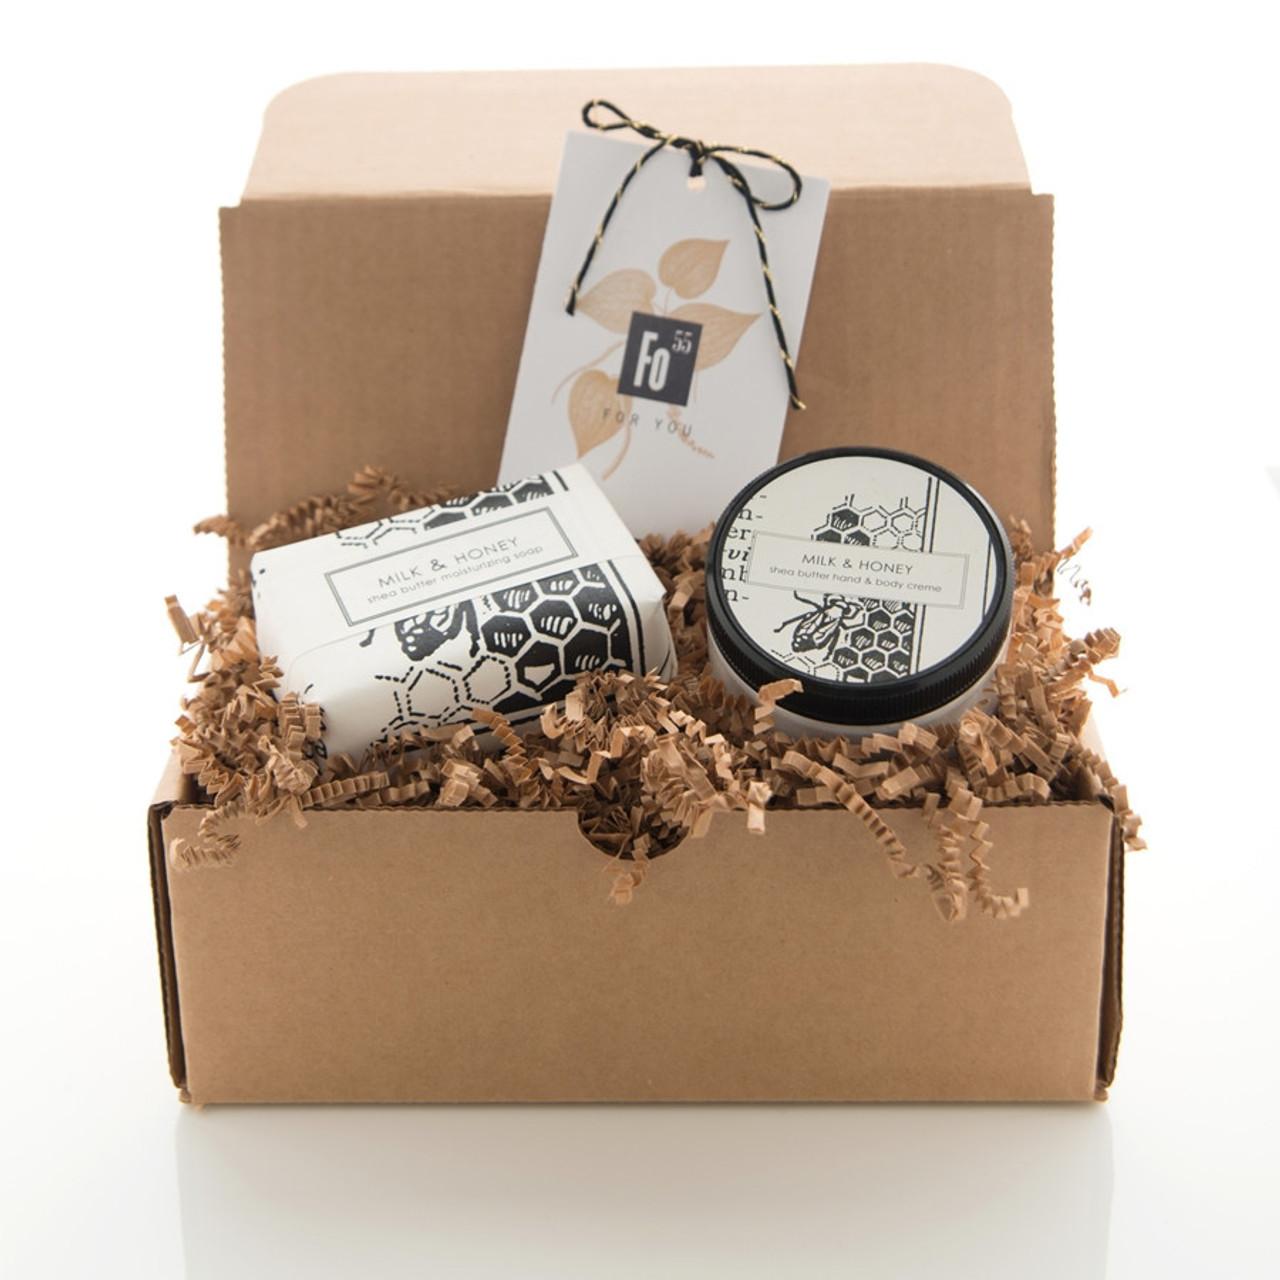 Bath and Spa Soap Gift Set